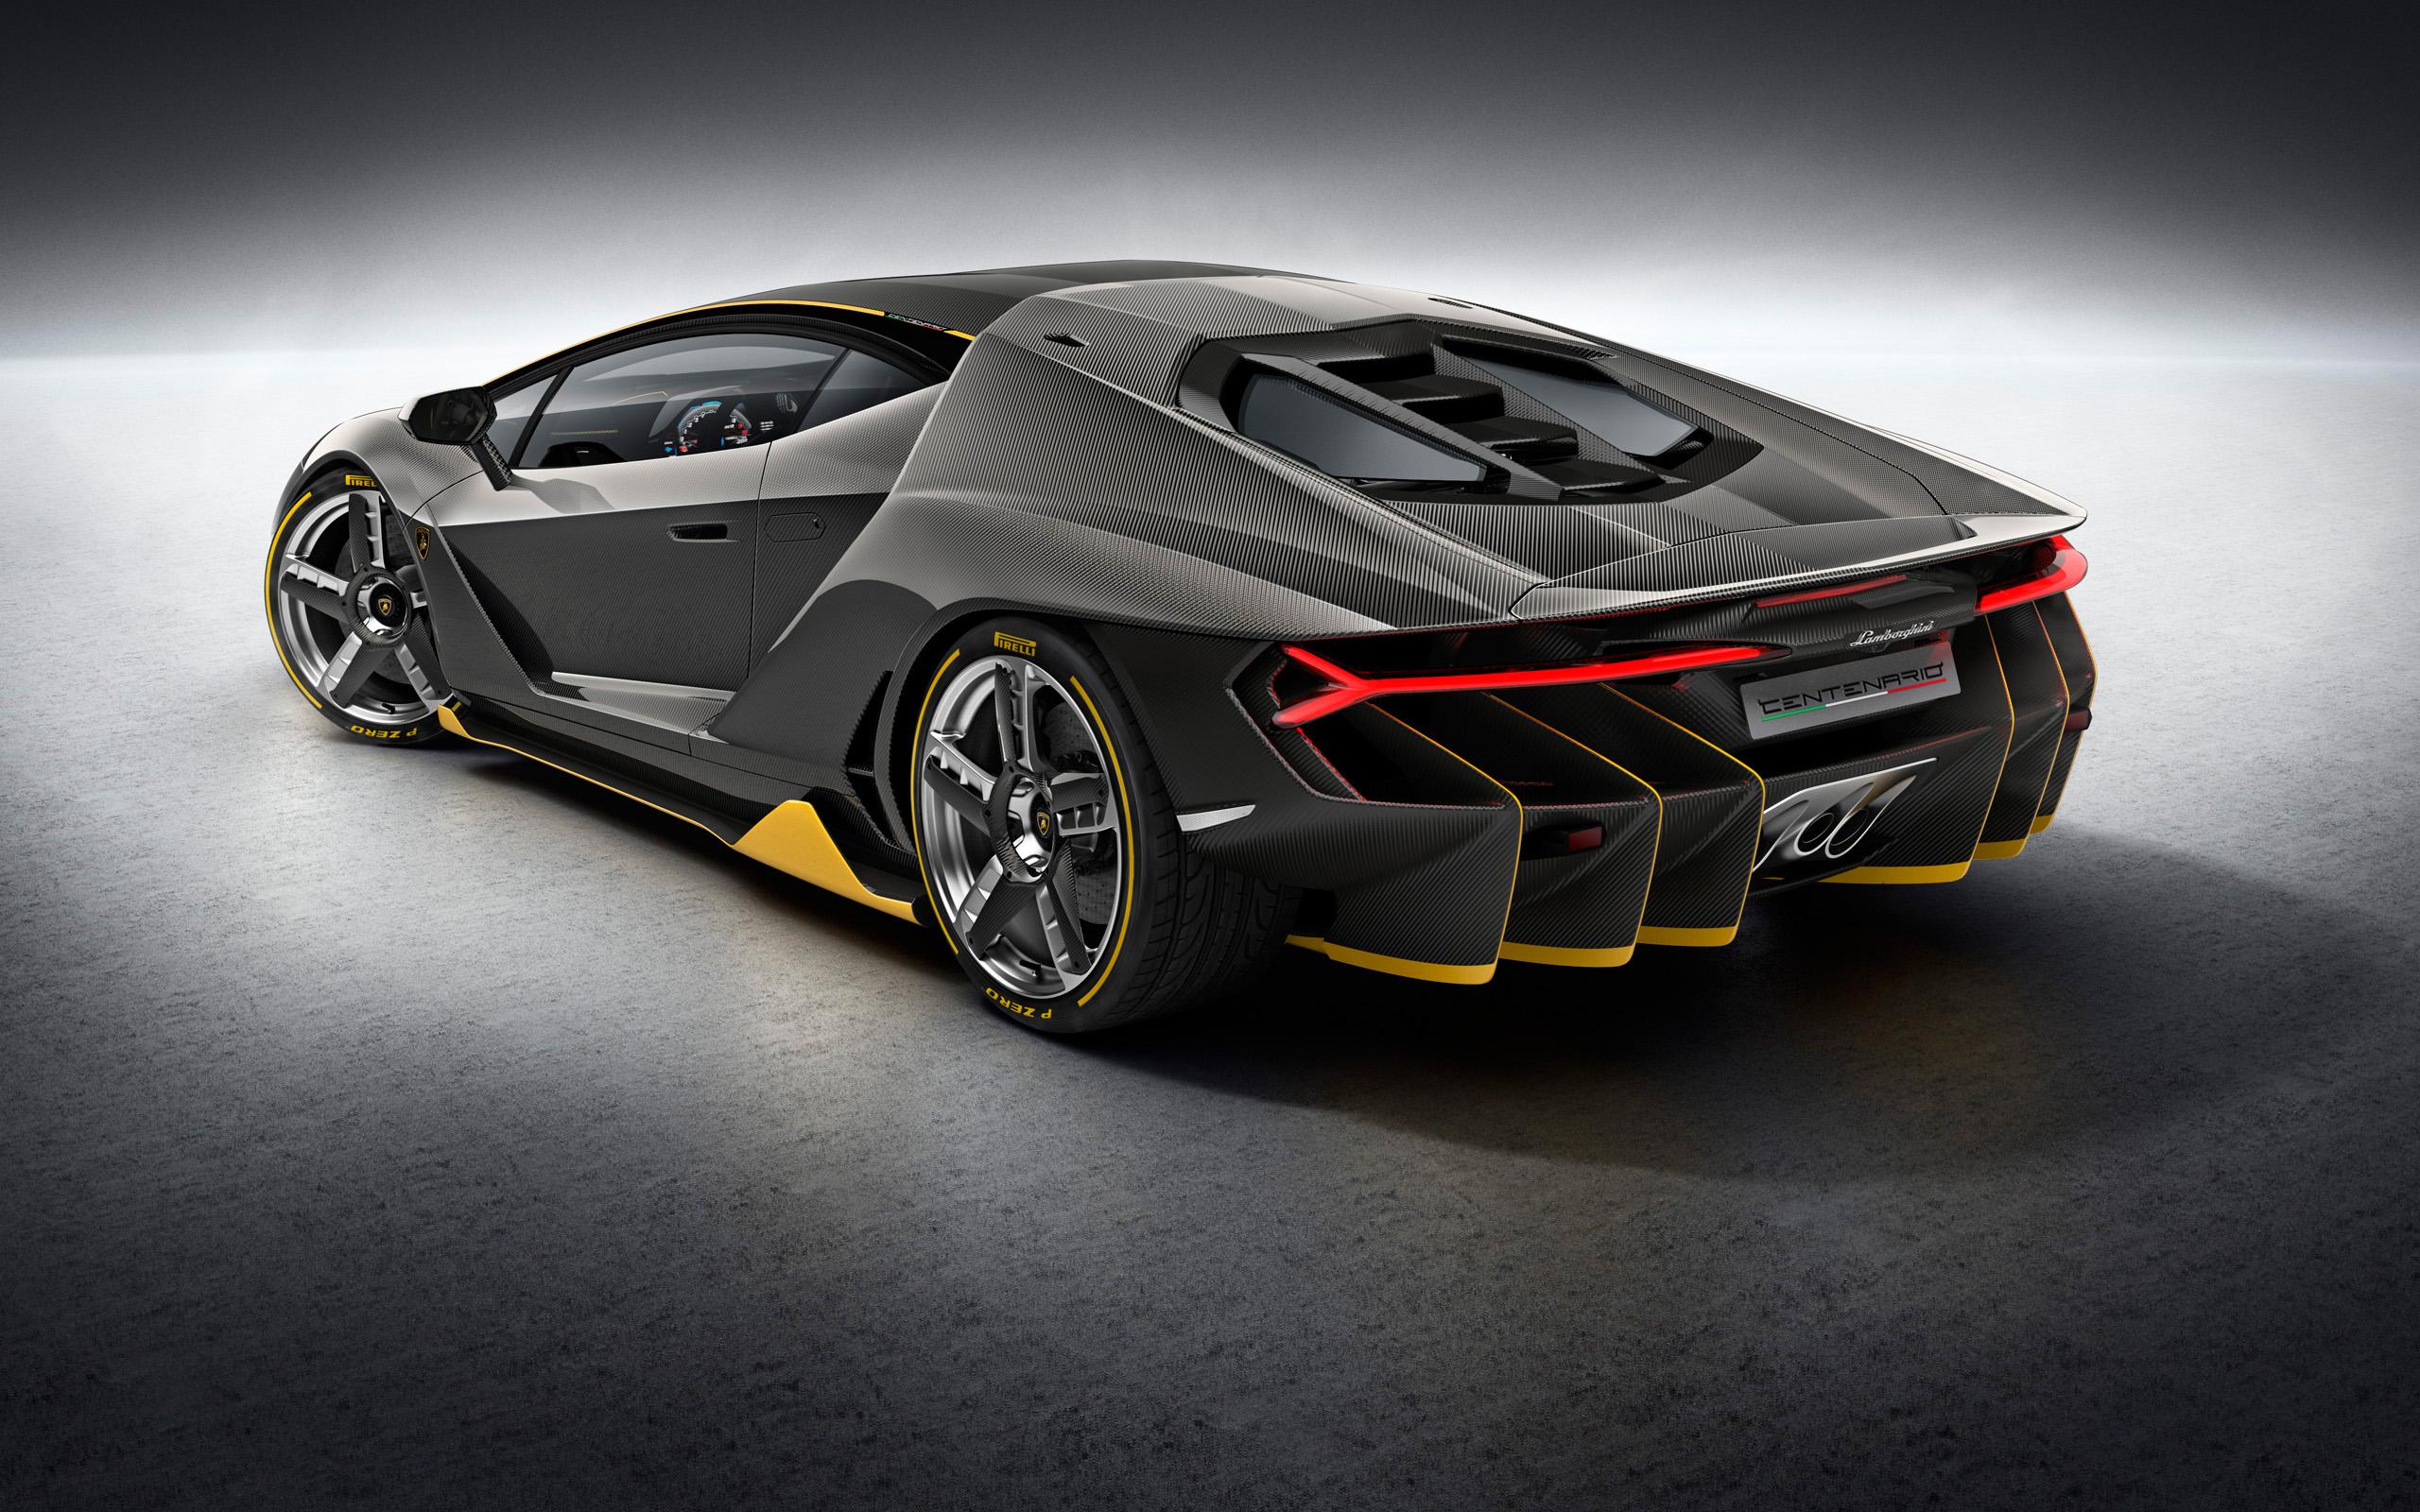 2016 Lamborghini Centenario Lp 770 4 4 Wallpaper Hd Car Wallpapers